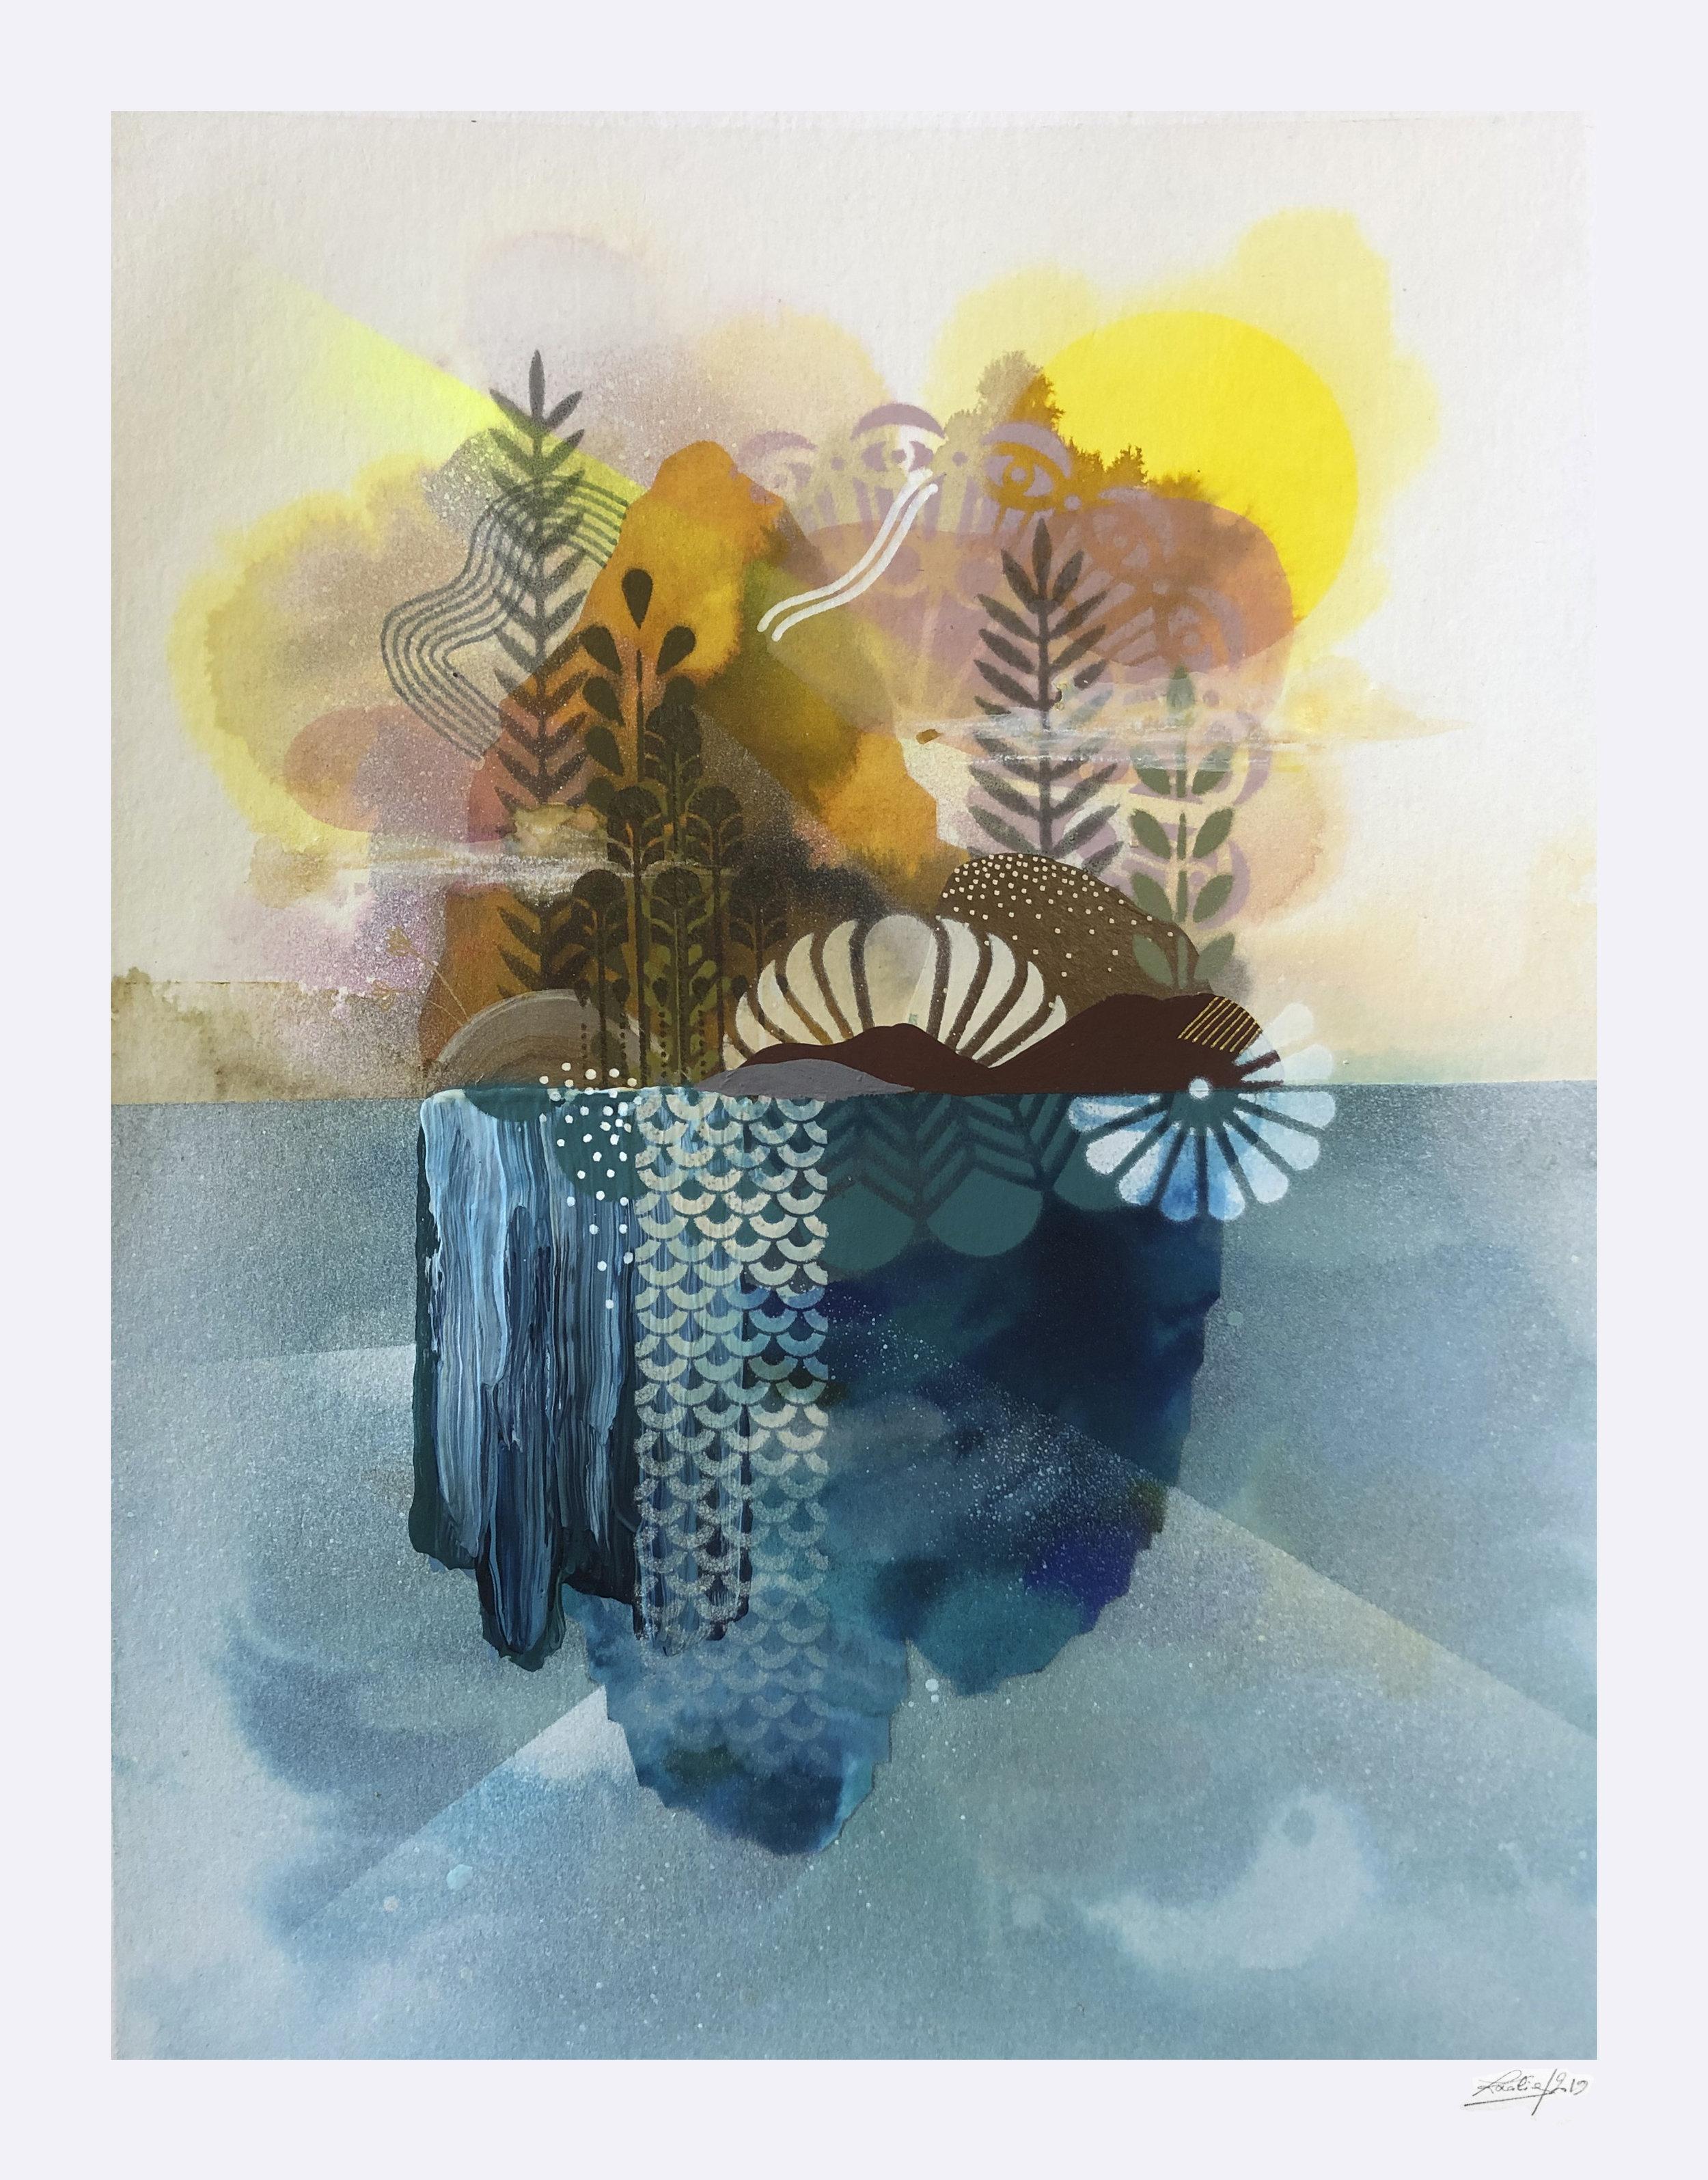 Jardin Flottant #1  - Mix media on paper - 36 x46 cm | 2019